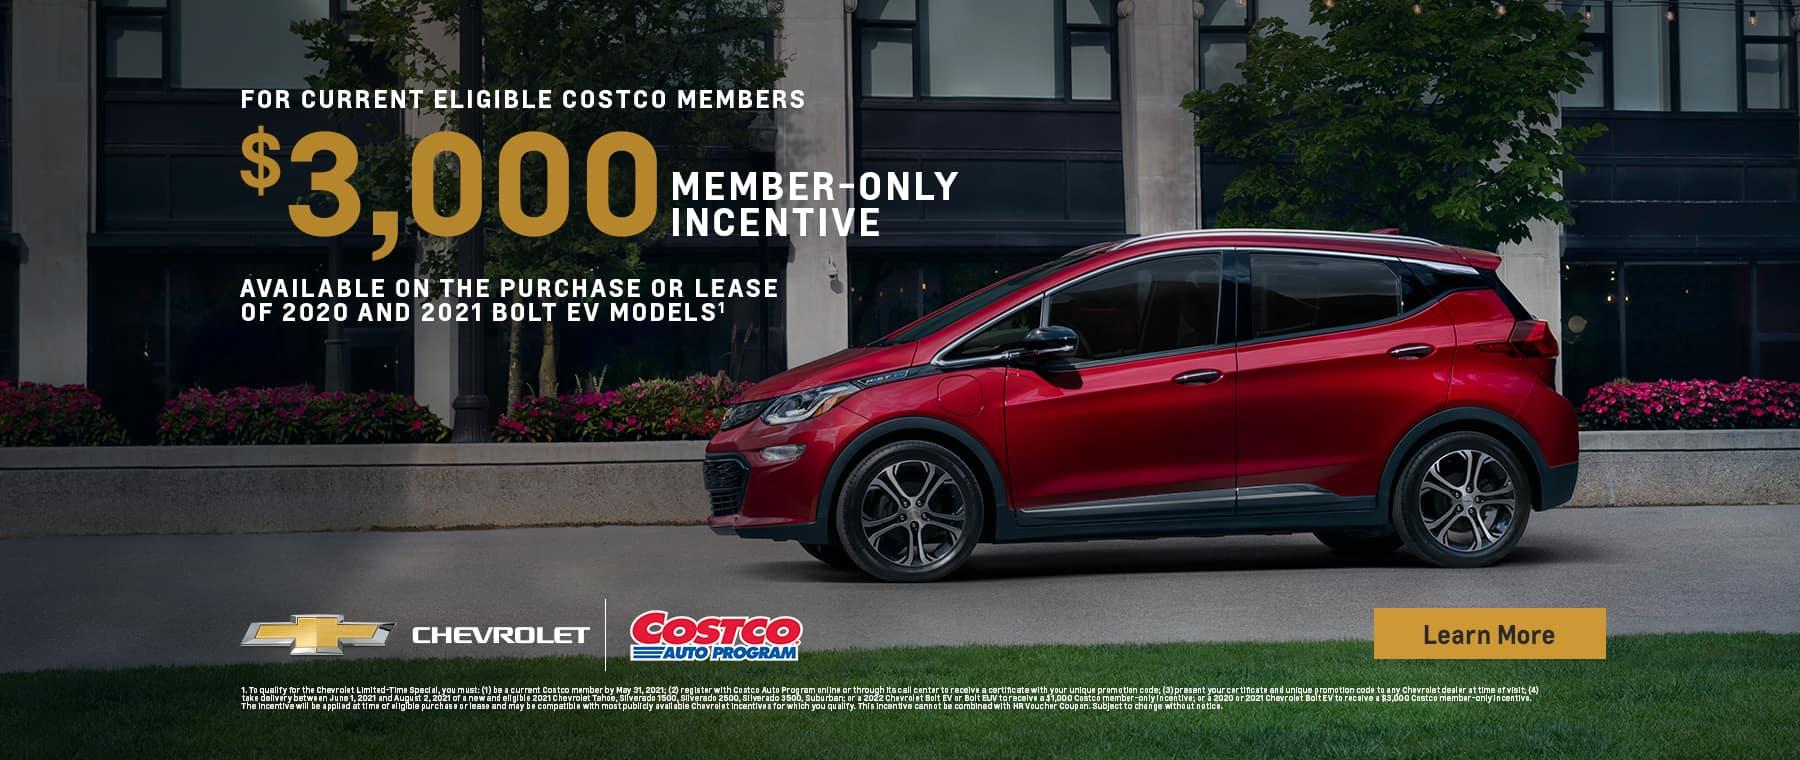 $1000 Costco Member Savings Incentive